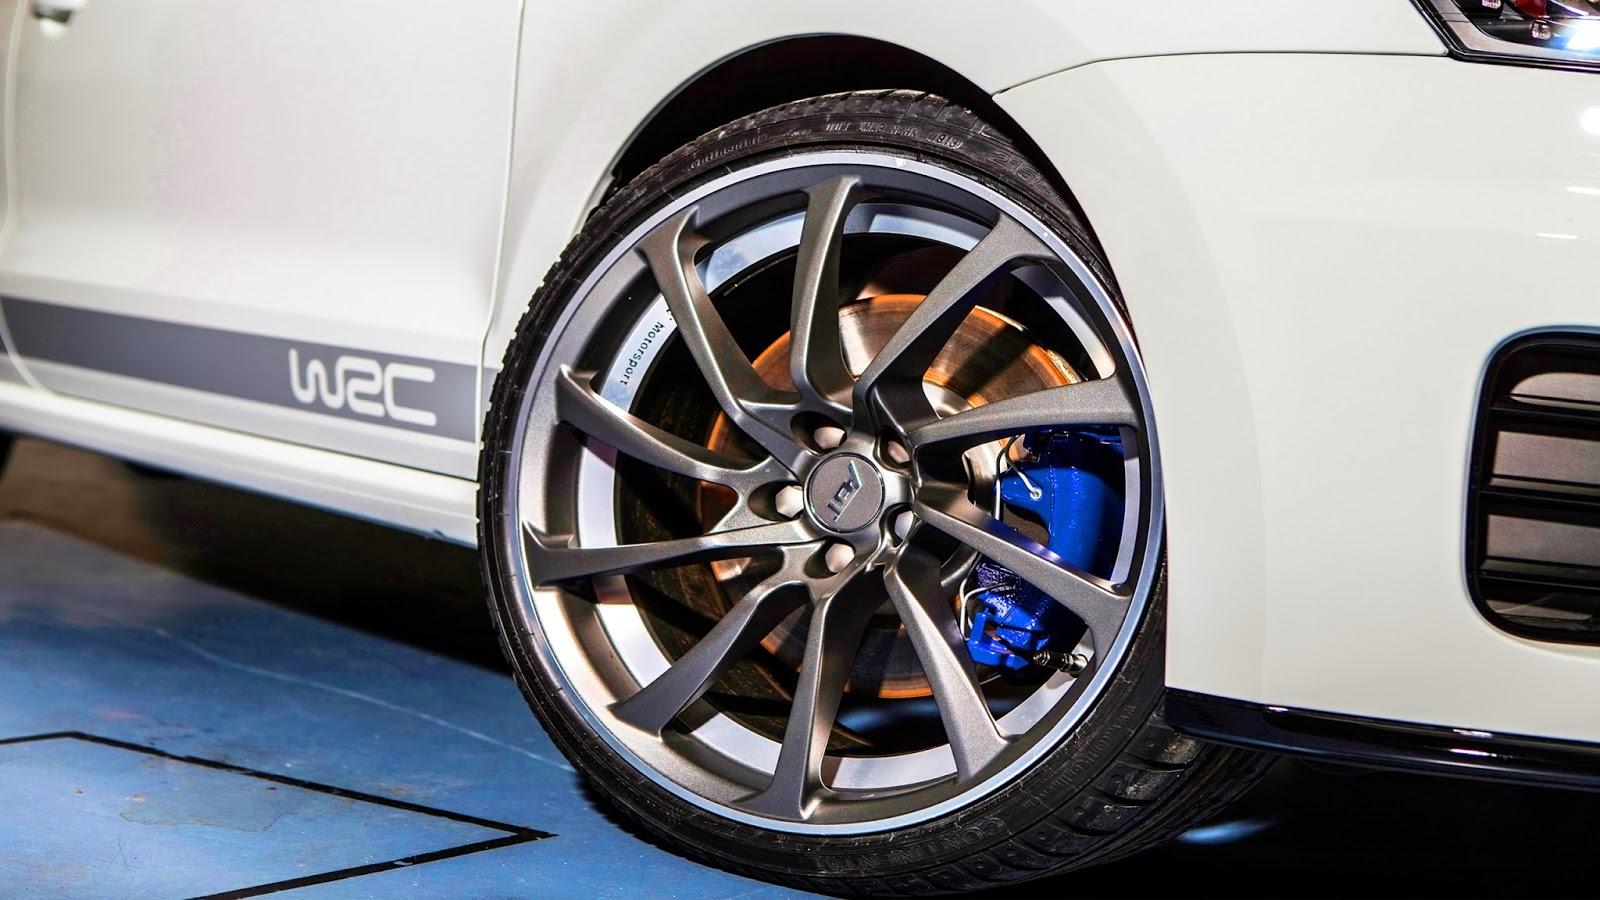 ABT Audi RS5-R 2014 aro 20 4.2 V8 470 cv 303 kmh 0-100 kmh 4,3 s-3.bp.blogspot.com